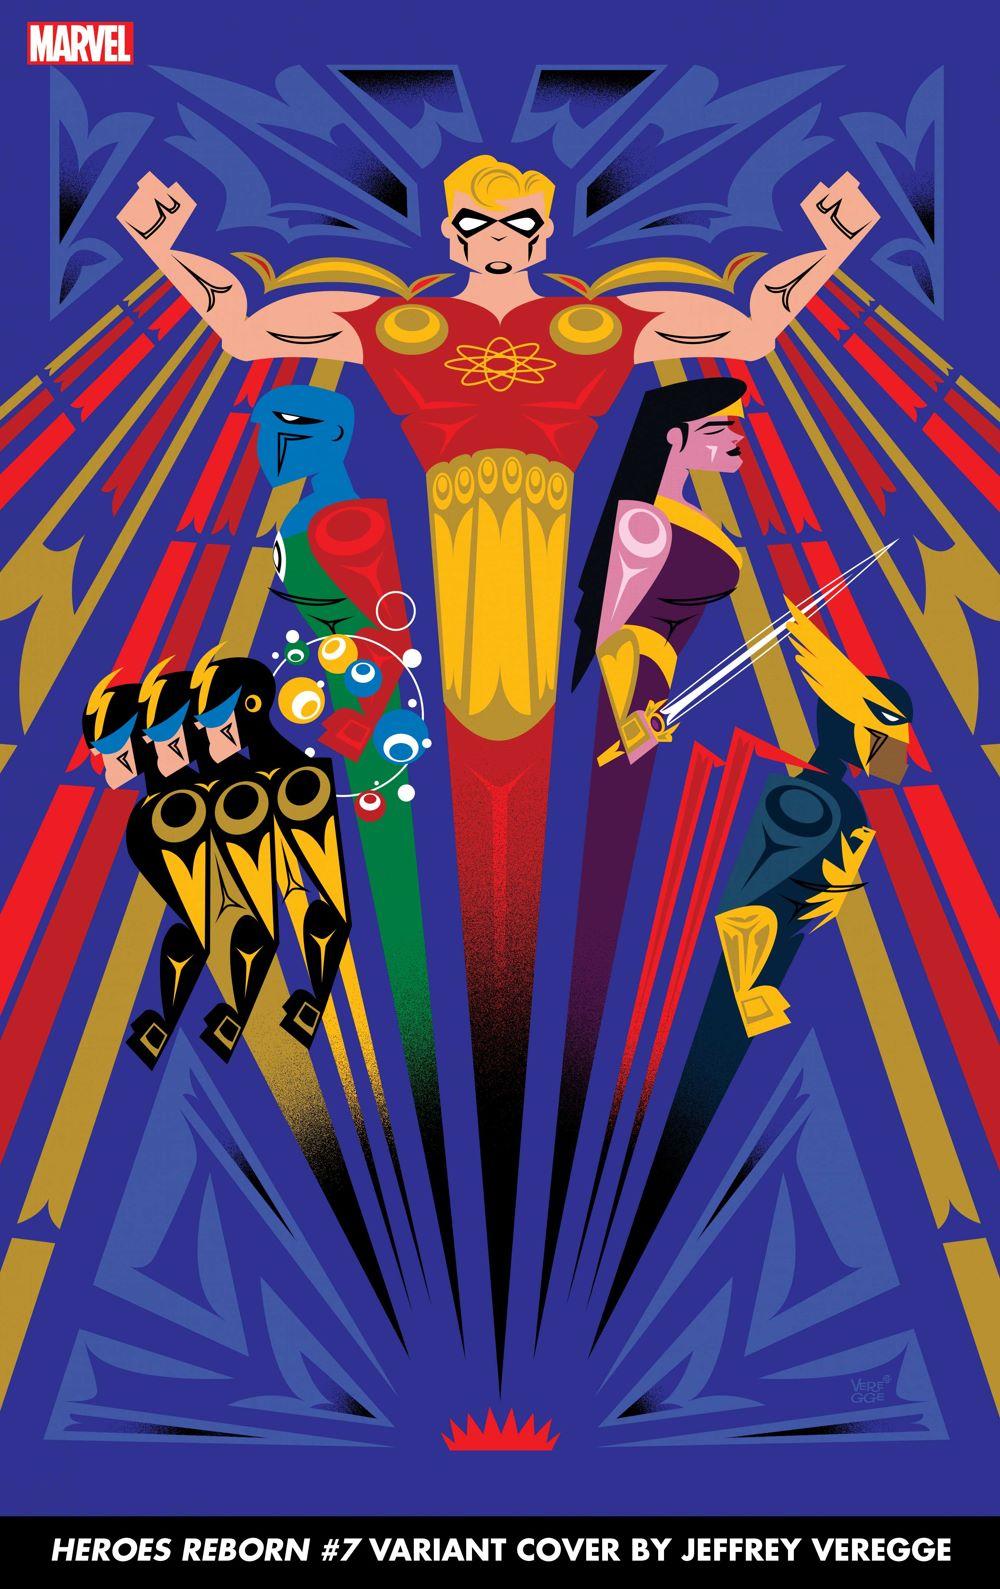 HEROESREBORN2021007_Veregge Marvel unleashes the final Jeffrey Veregge HEROES REBORN variant covers